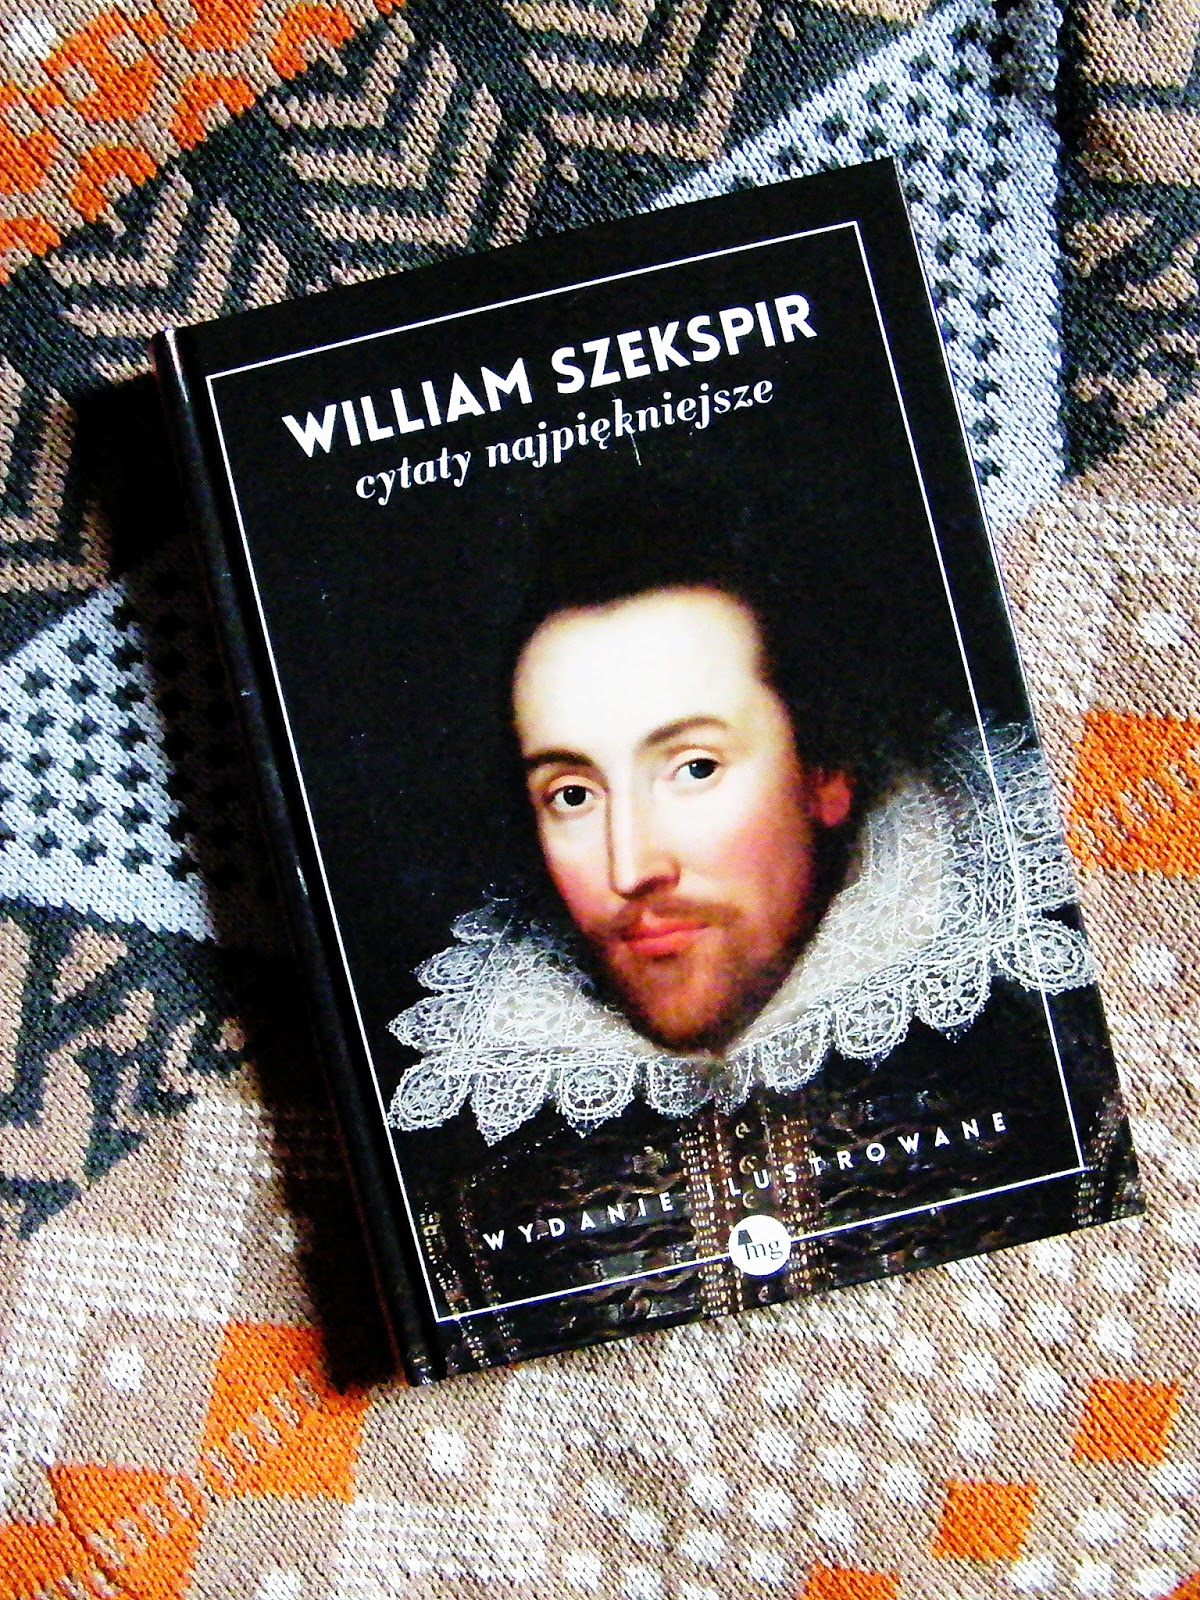 32 Dorota Malinowska Grupińska William Szekspir Cytaty